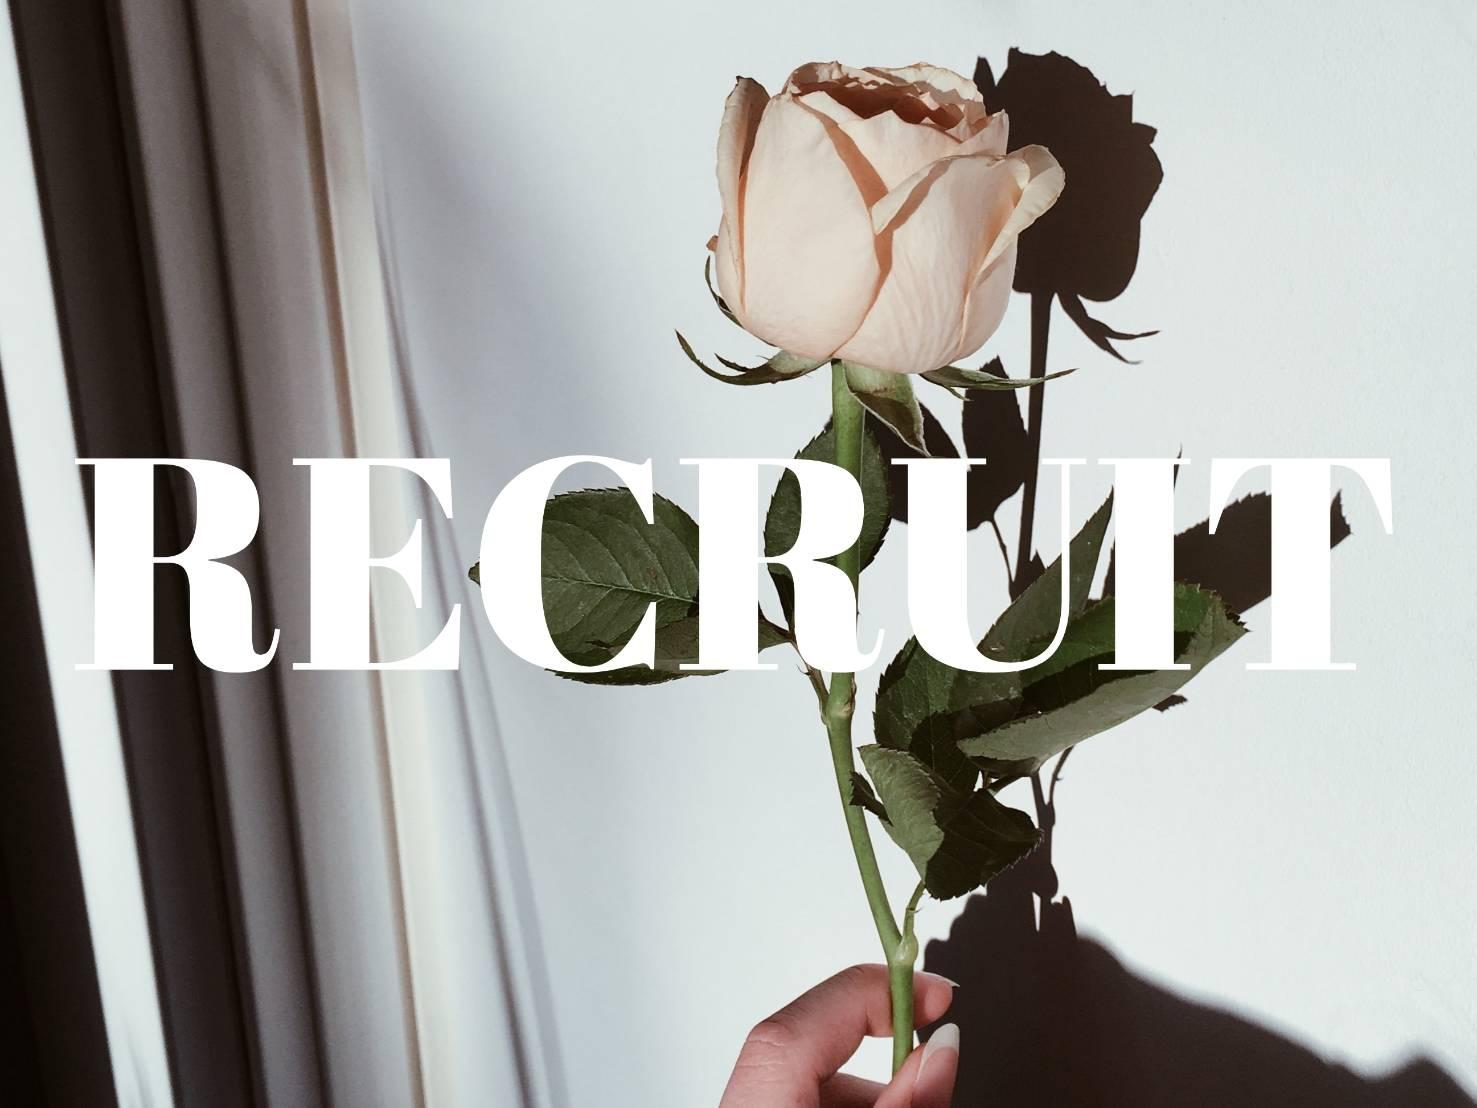 【RECRUIT】インスタライバー募集